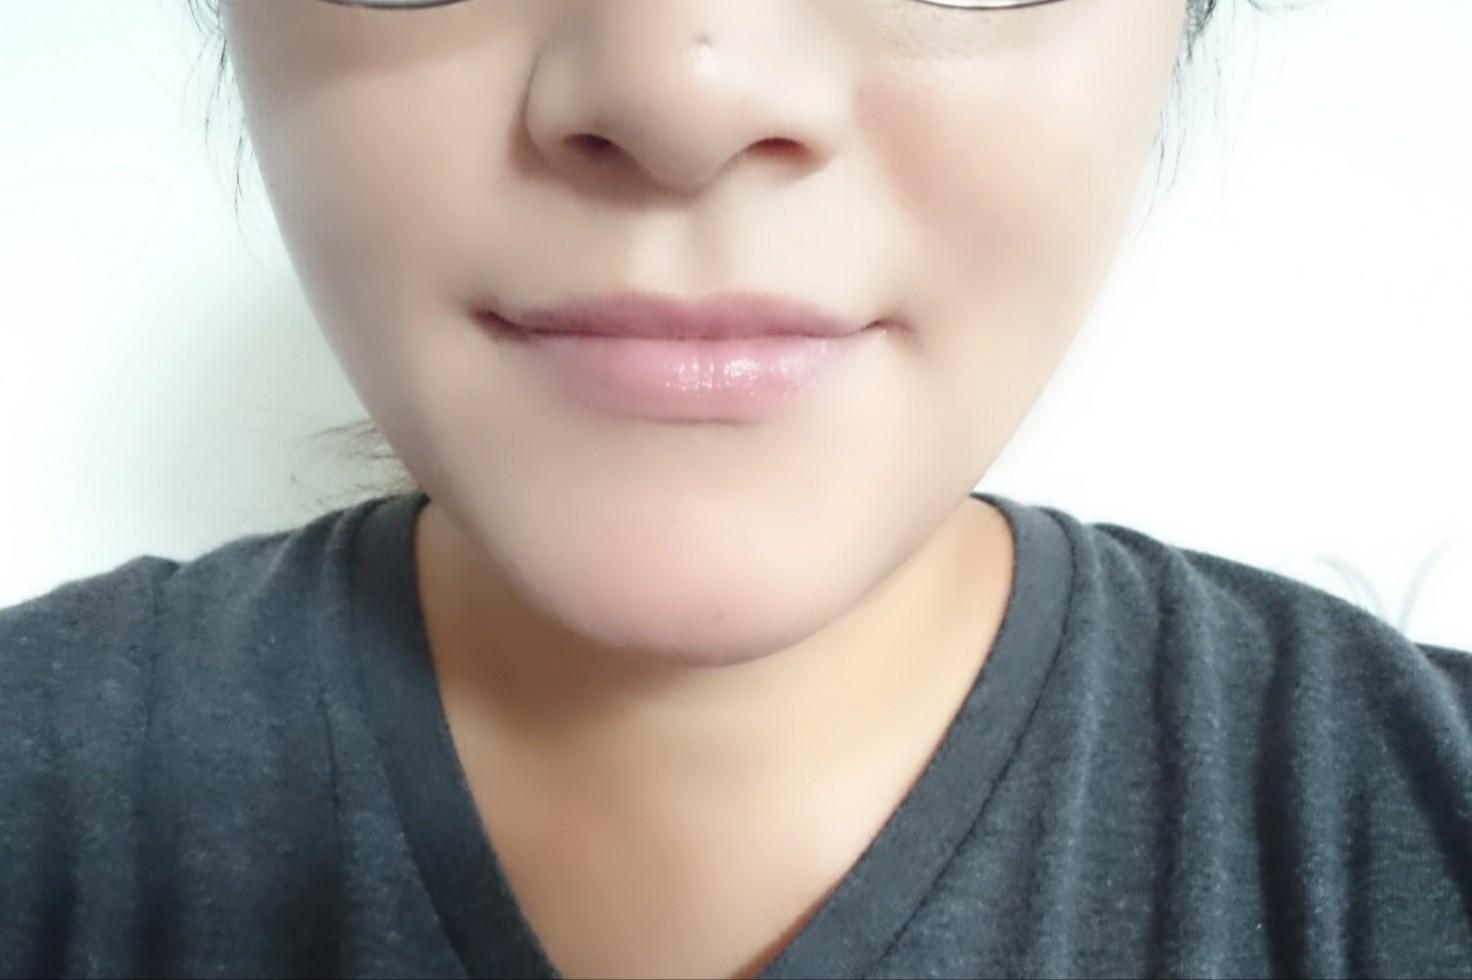 Too Faced(トゥーフェイスド)ハングオーバー  ピロー バーム リップ トリートメントを使った恵未さんのクチコミ画像4